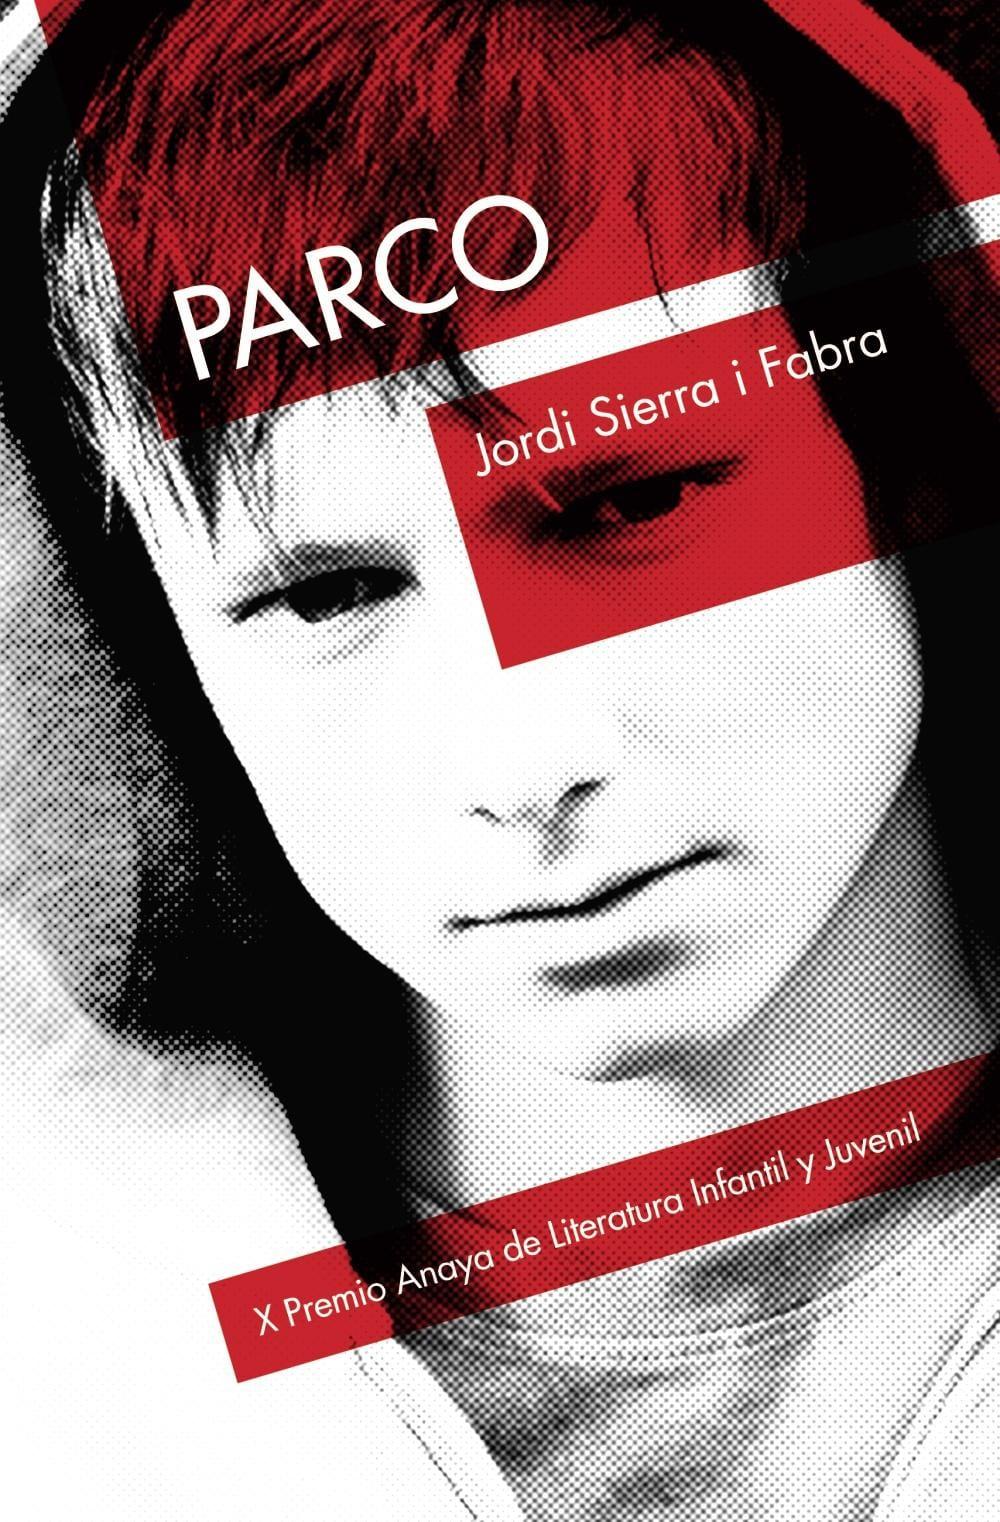 Parco, Jordi Sierra i Fabra – Reseña